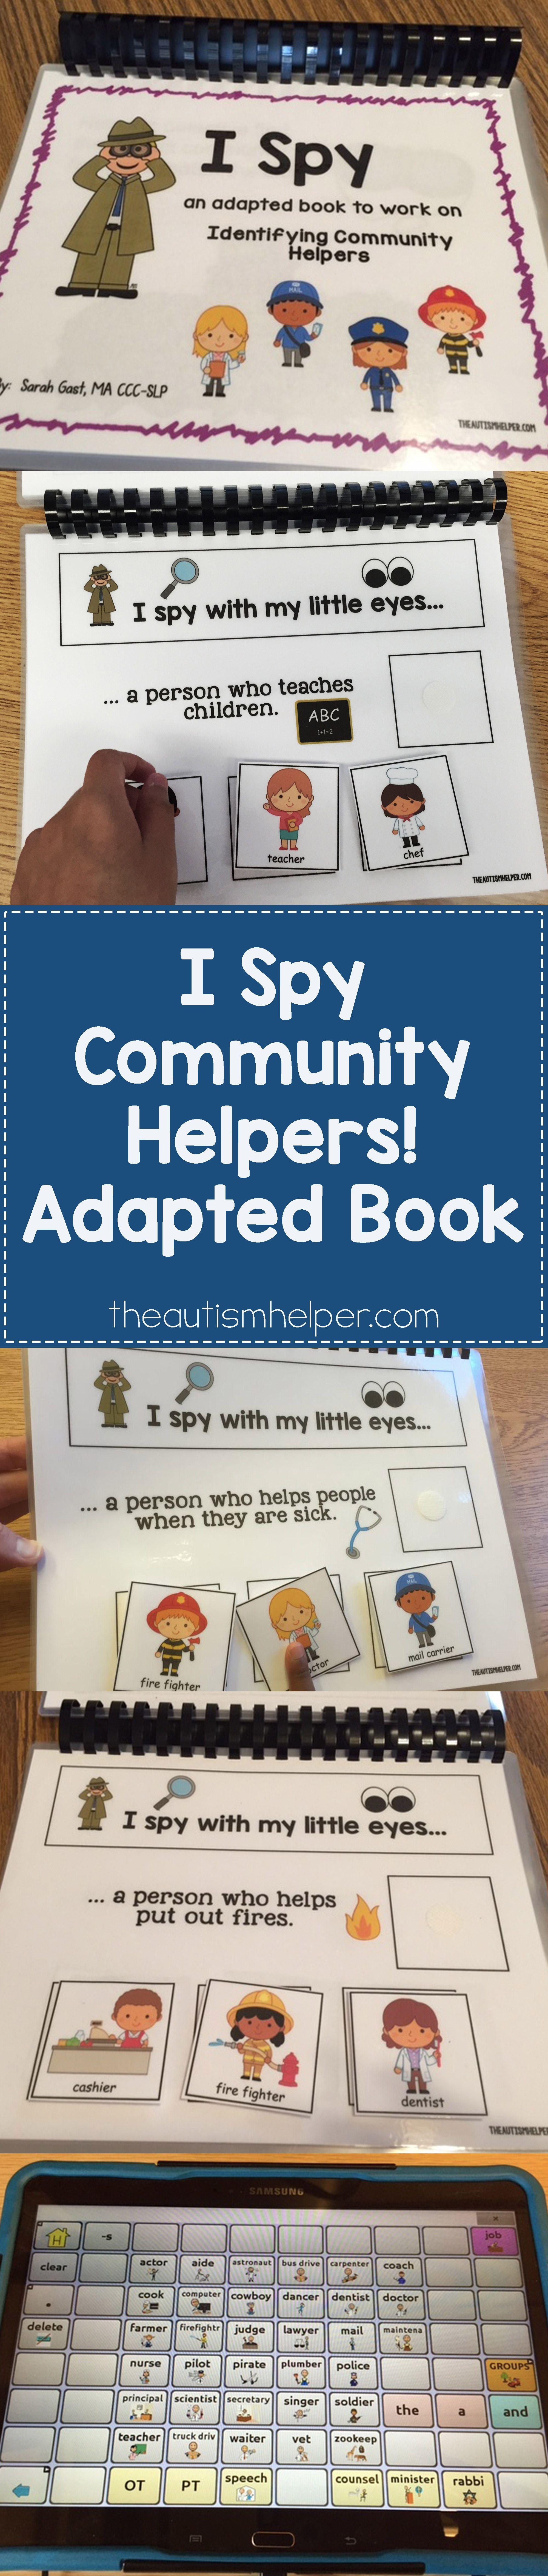 I Spy Community Helpers